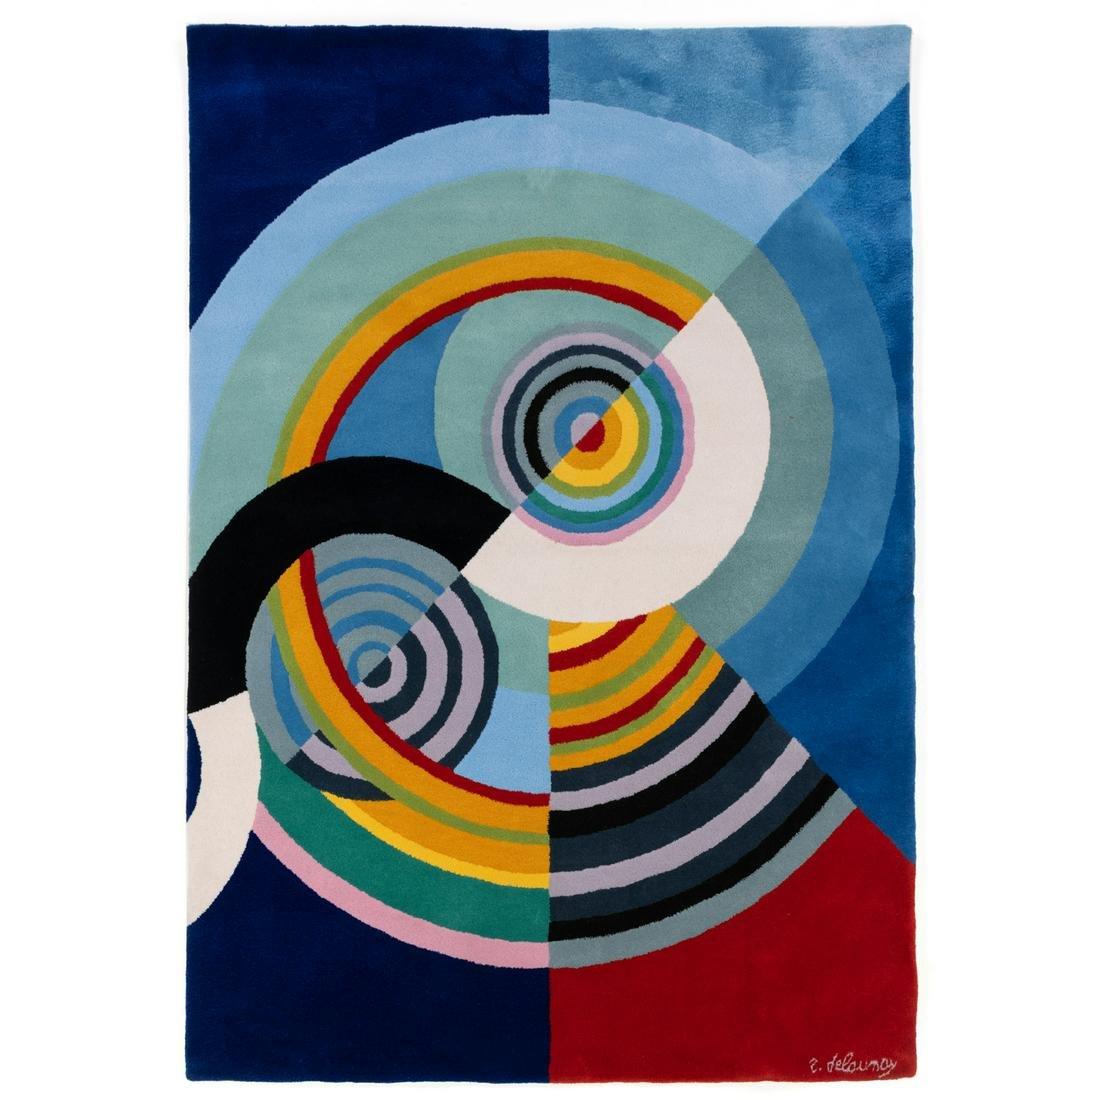 after Robert Delaunay (1885-1941)